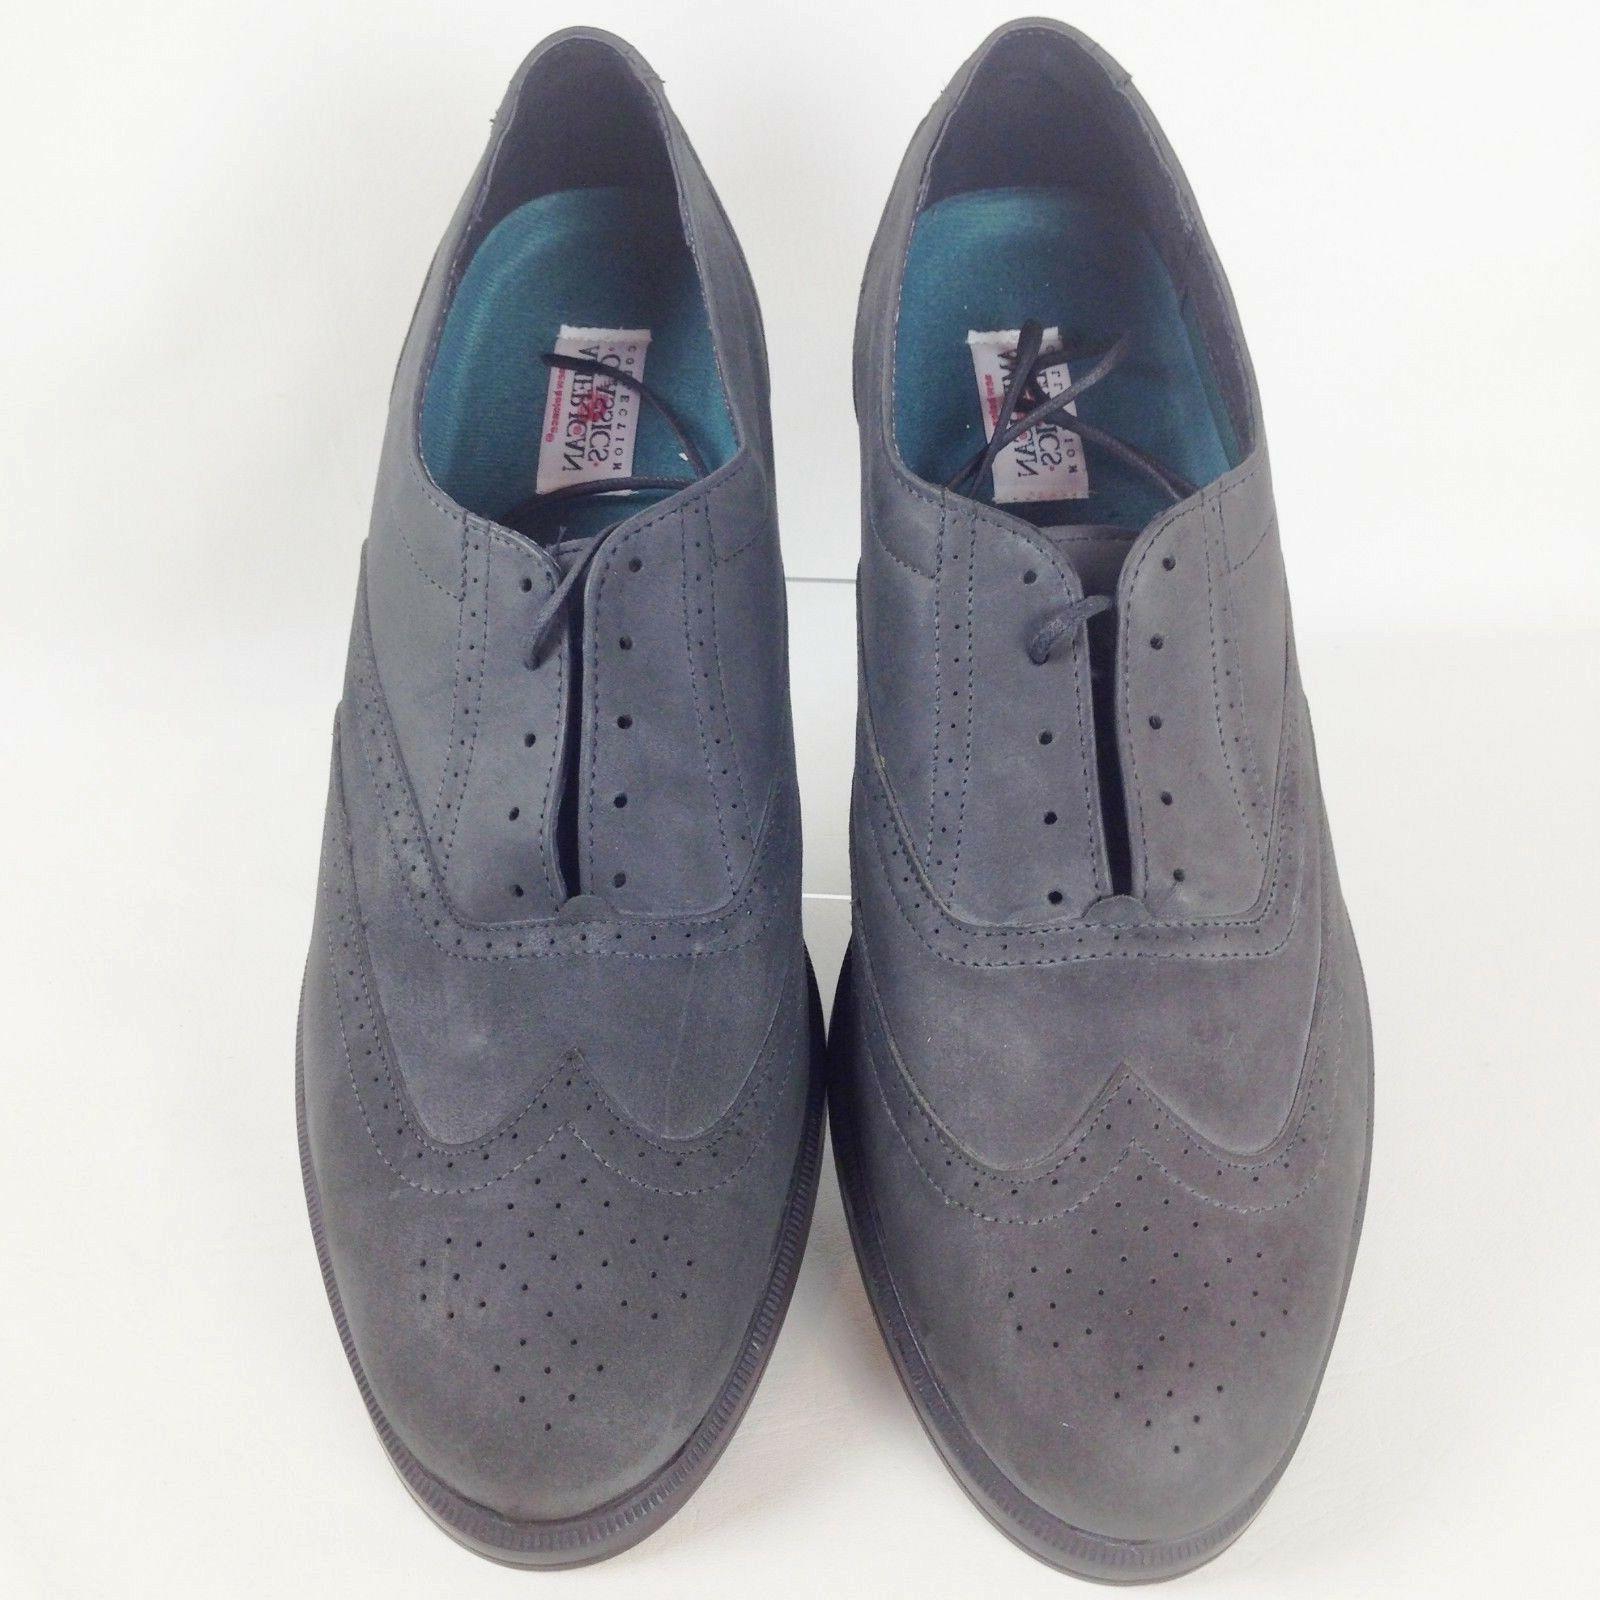 New Balance Men's Dress Shoes B Wingtip